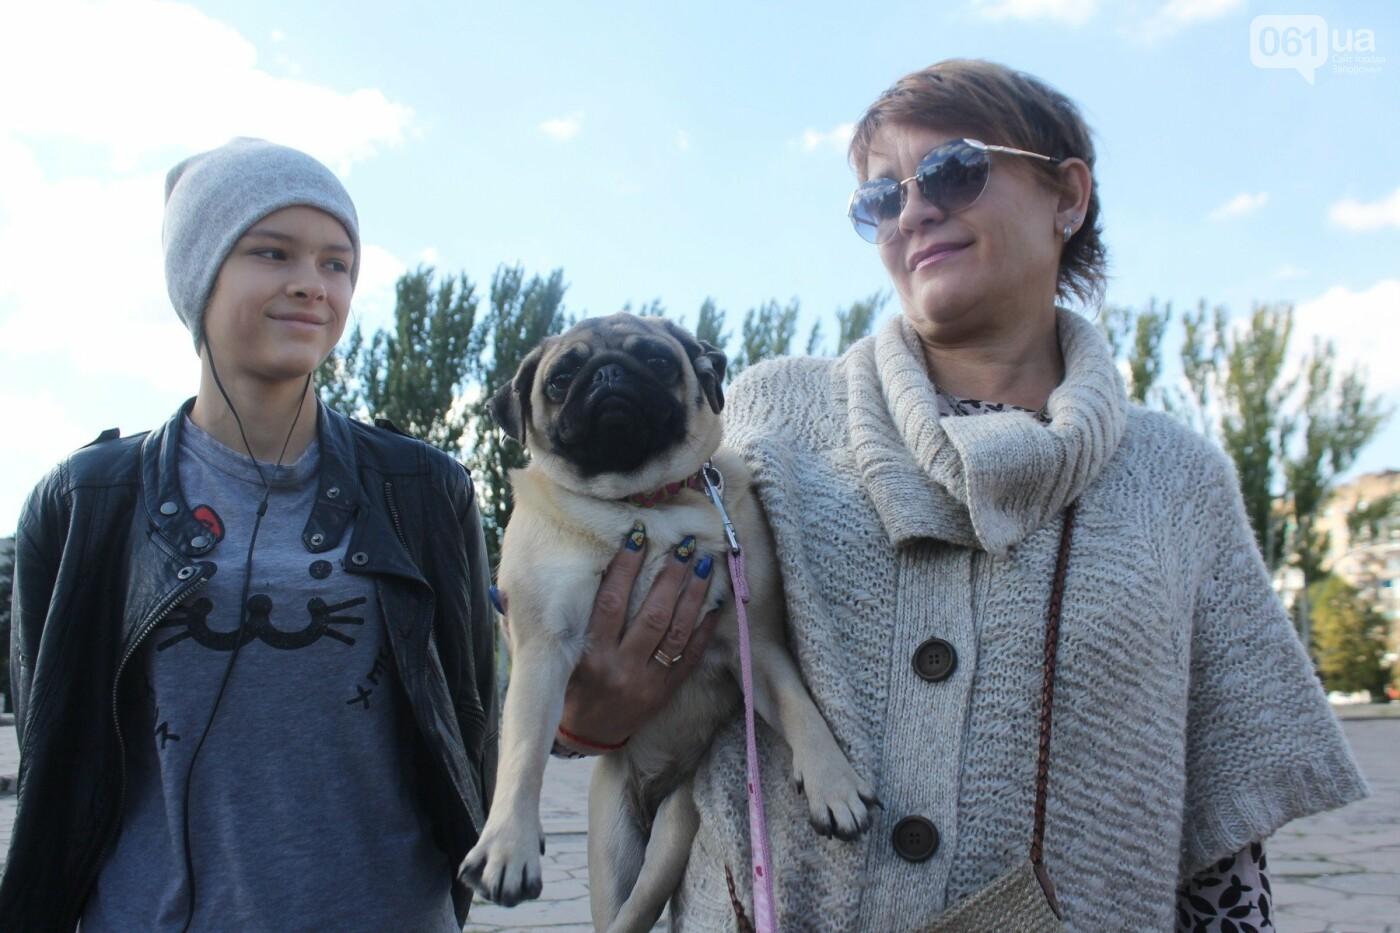 «Защити! Не мучай»: в Запорожье провели марш за права животных, – ФОТОРЕПОРТАЖ, ВИДЕО, фото-15